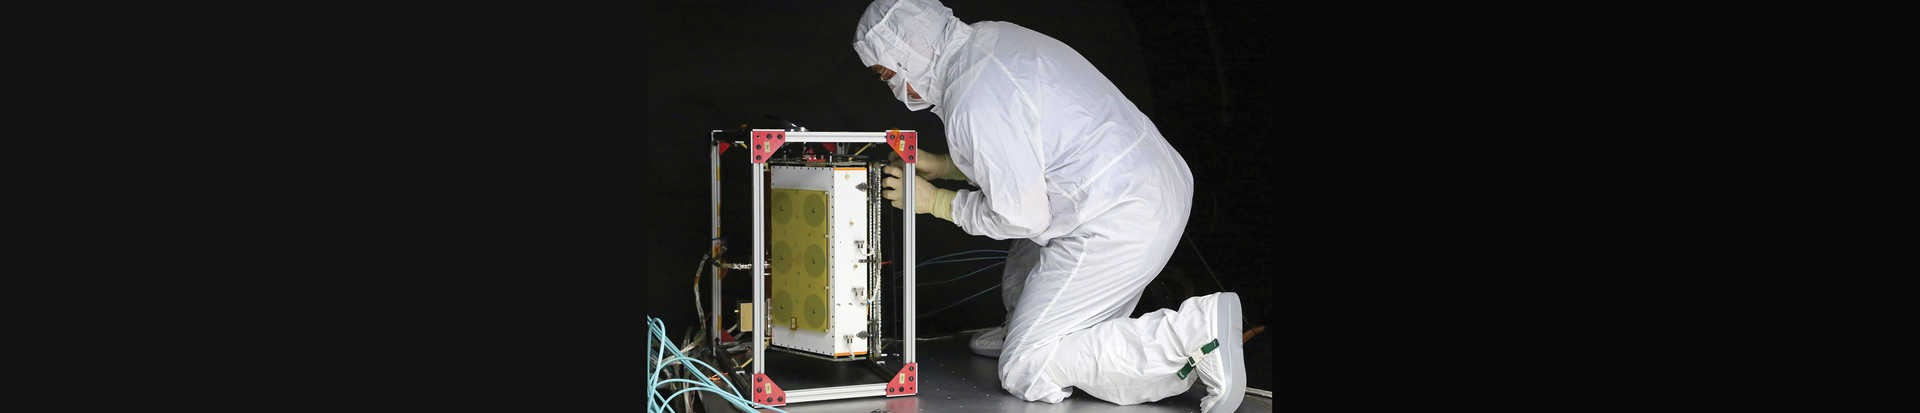 Preparing CYGNSS microsatellite for testing